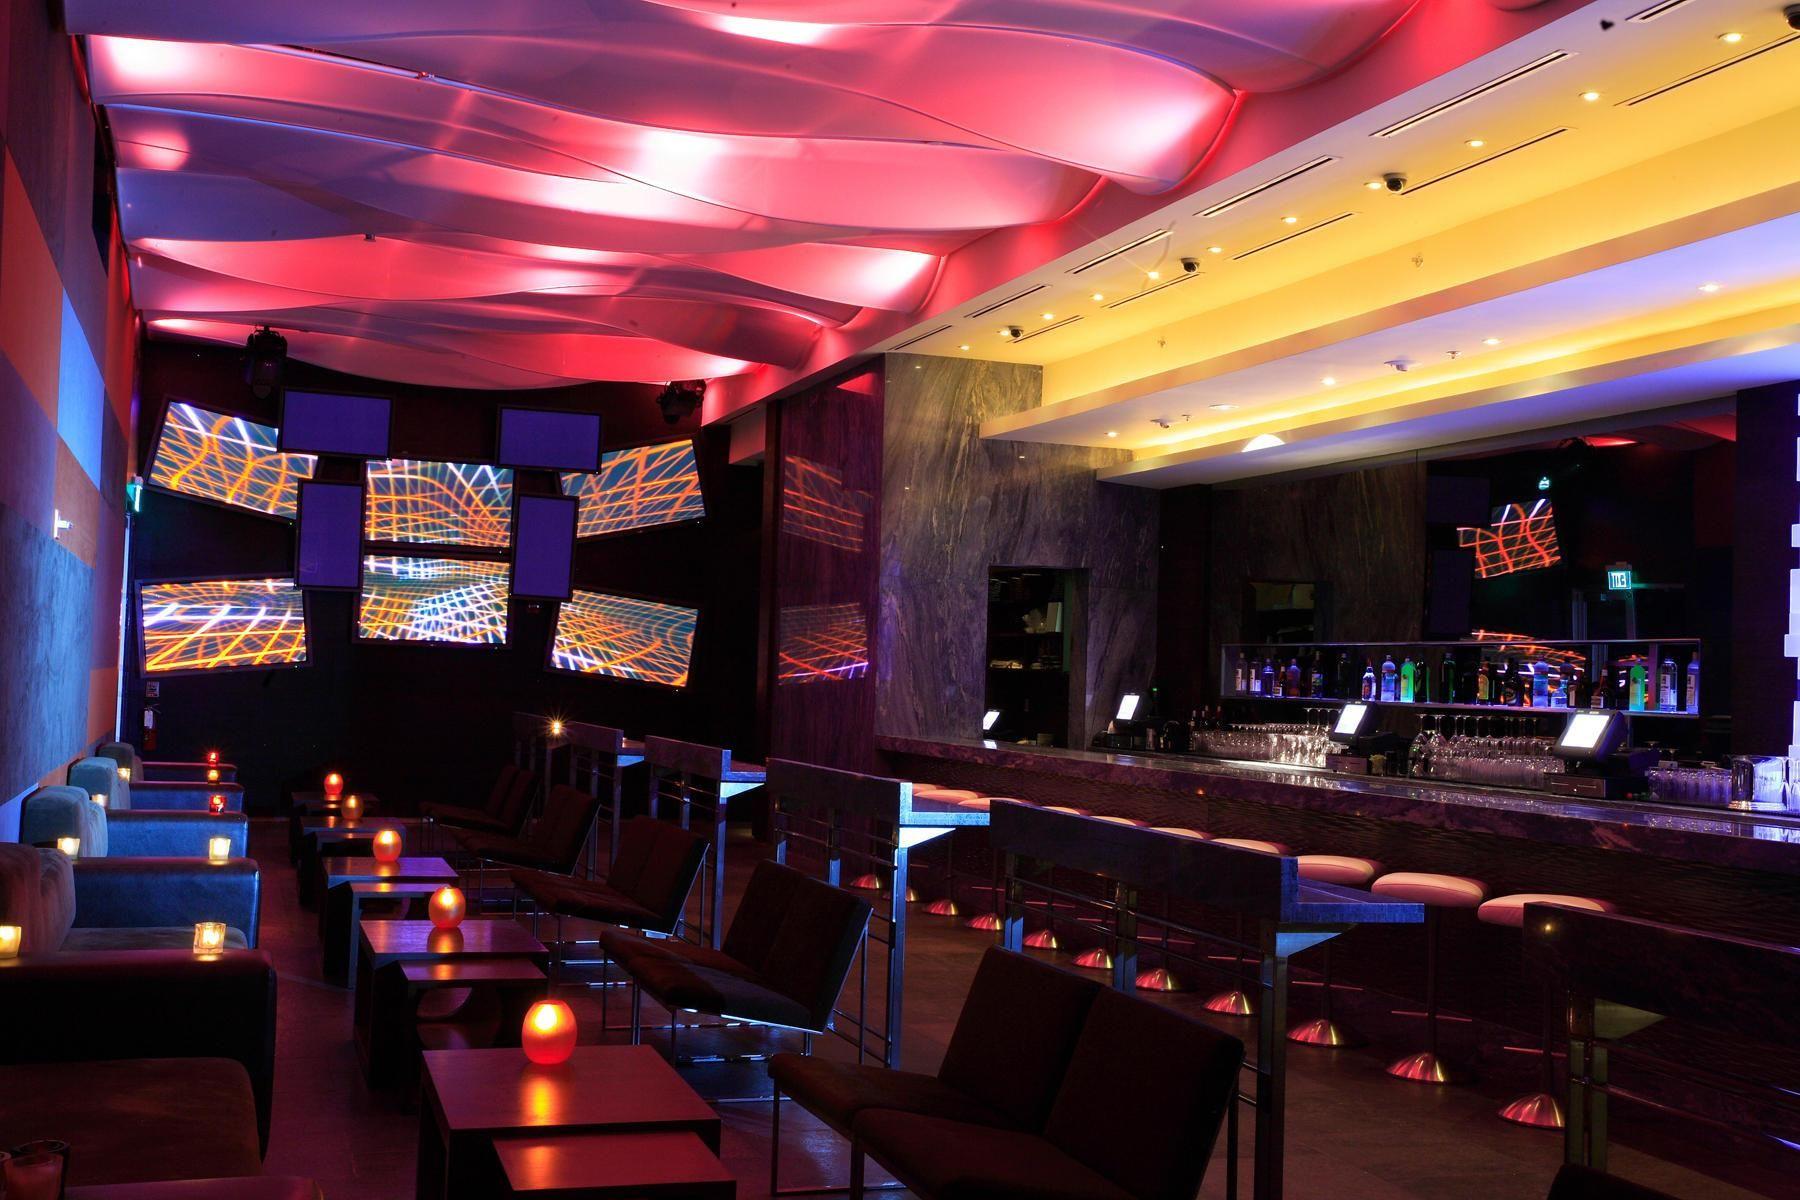 Restaurant Lounge   Google Search